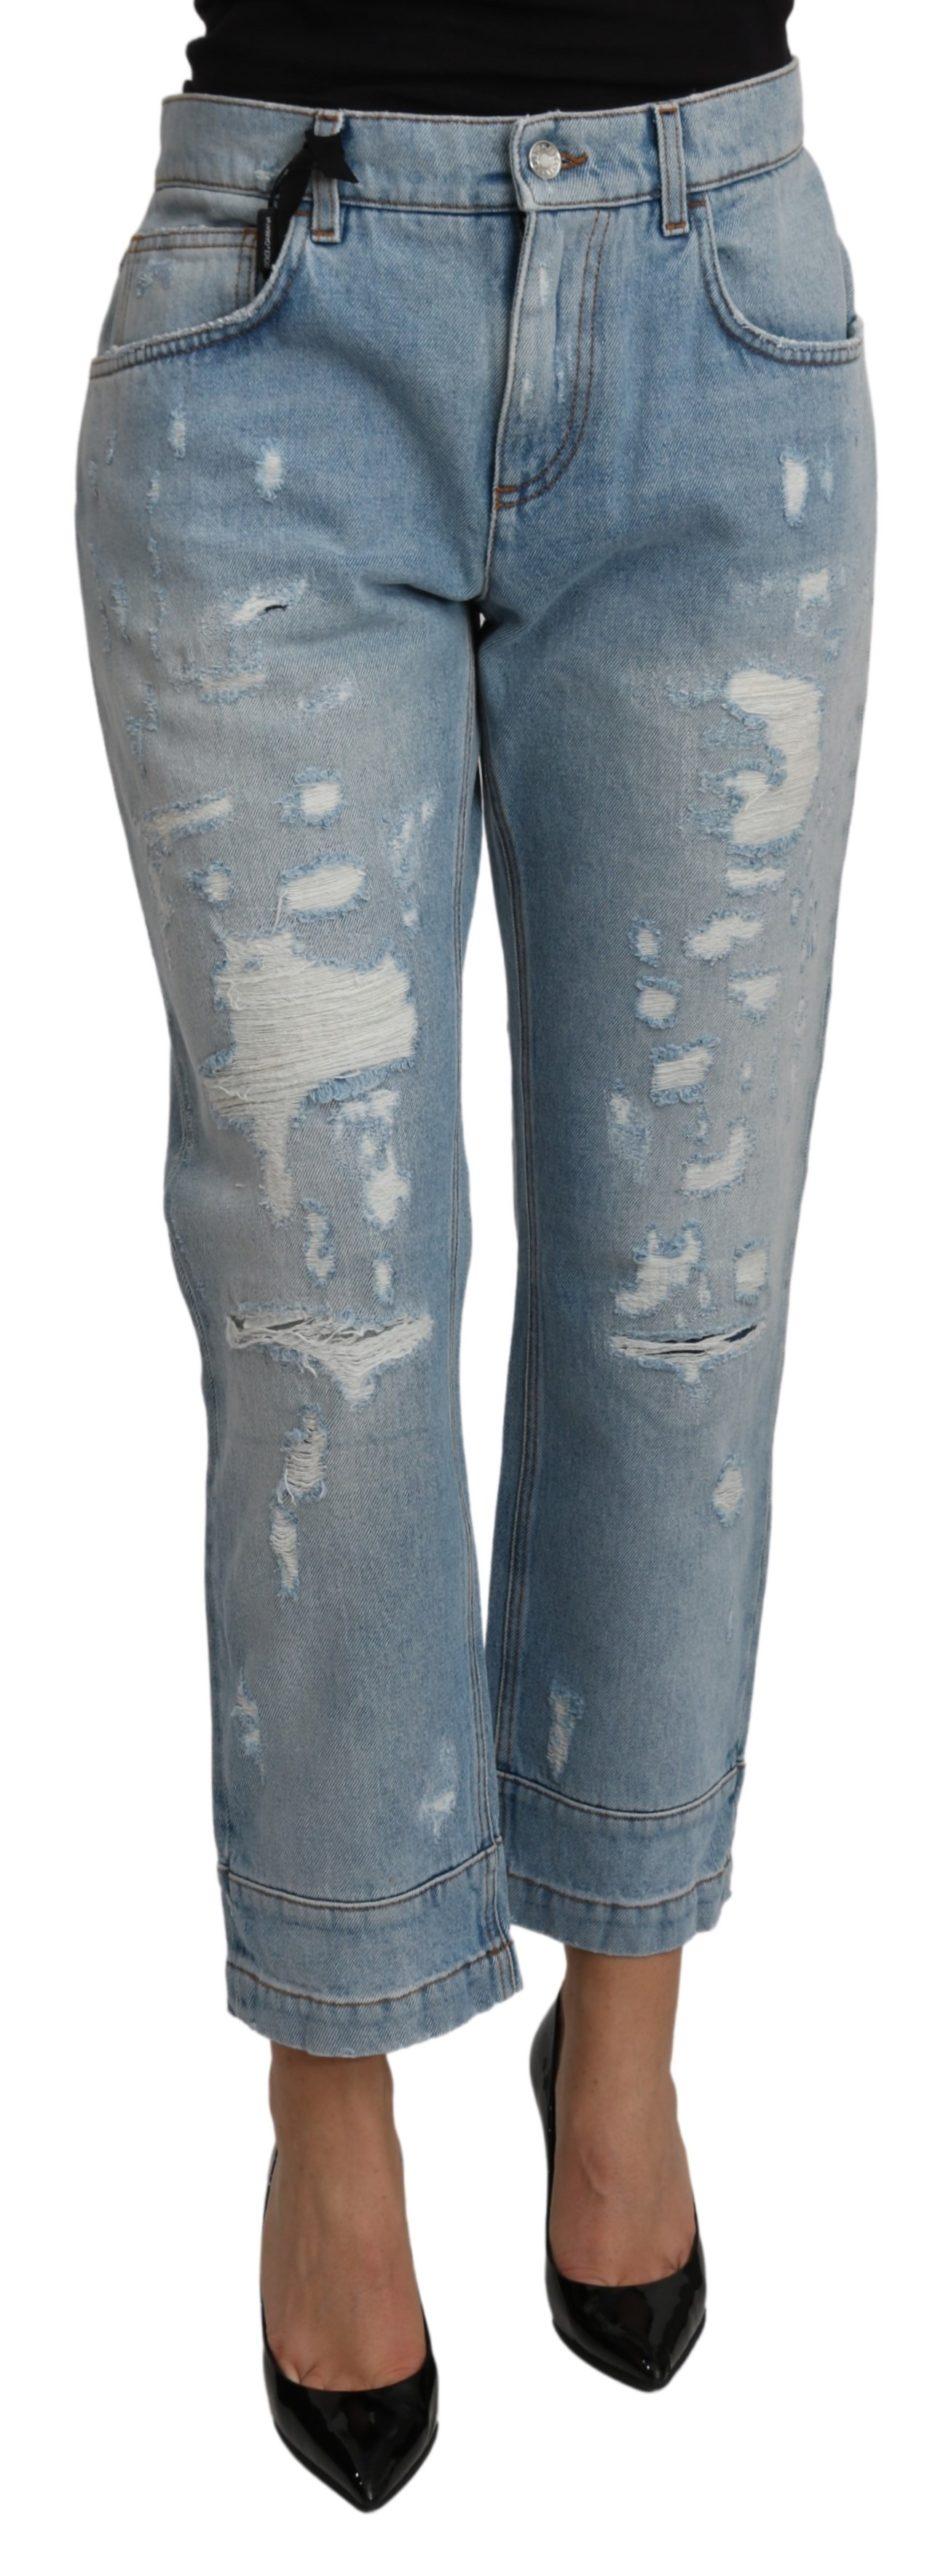 Dolce & Gabbana Women's Ripped Boyfriend Denim Jeans Blue PAN71108 - IT42|M